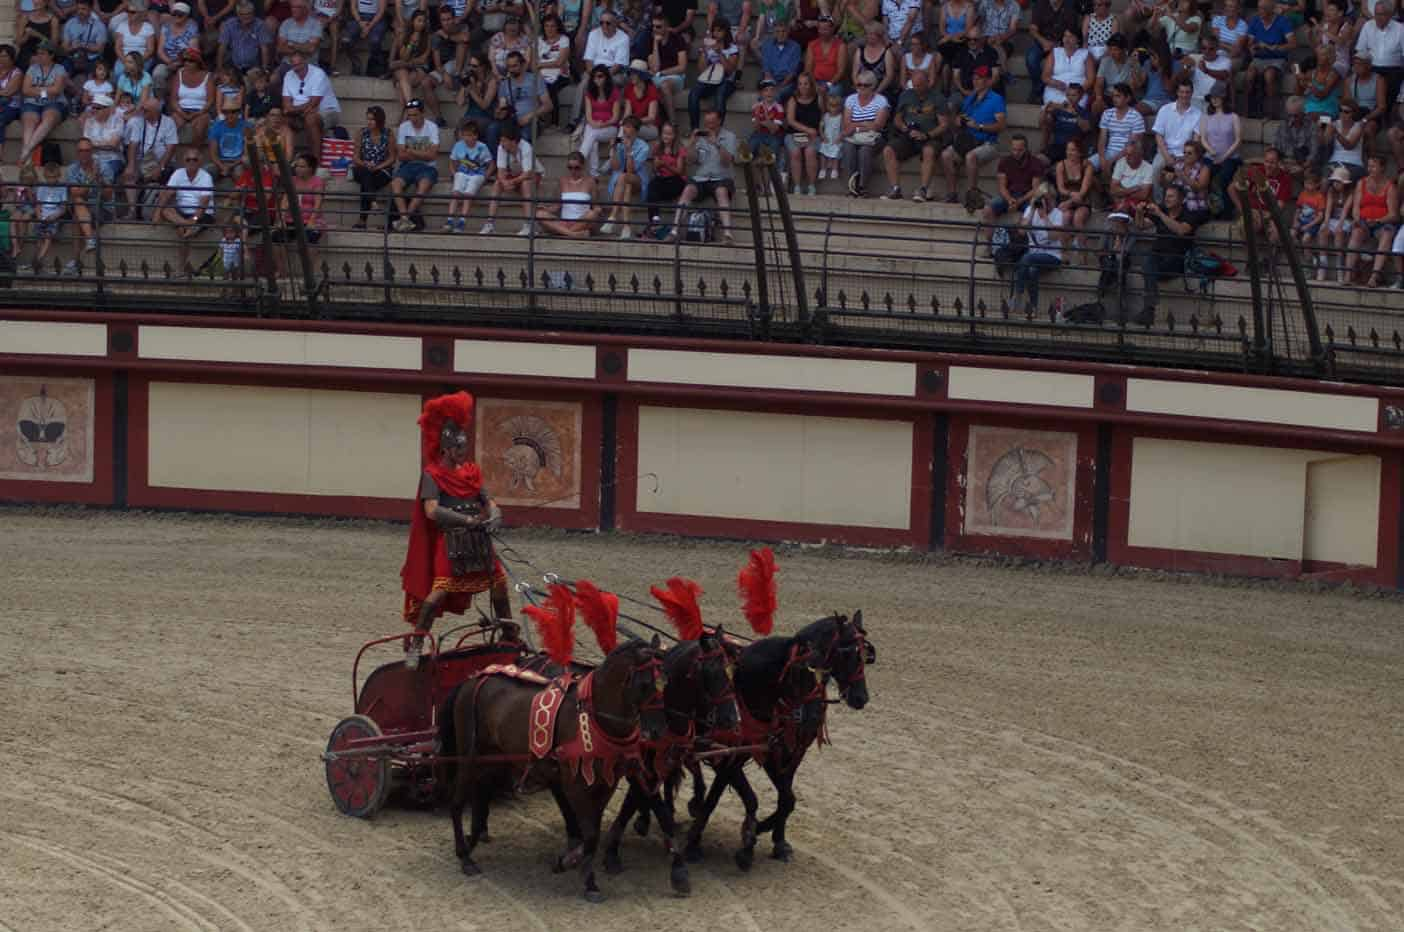 Puy du fou gladiatoren